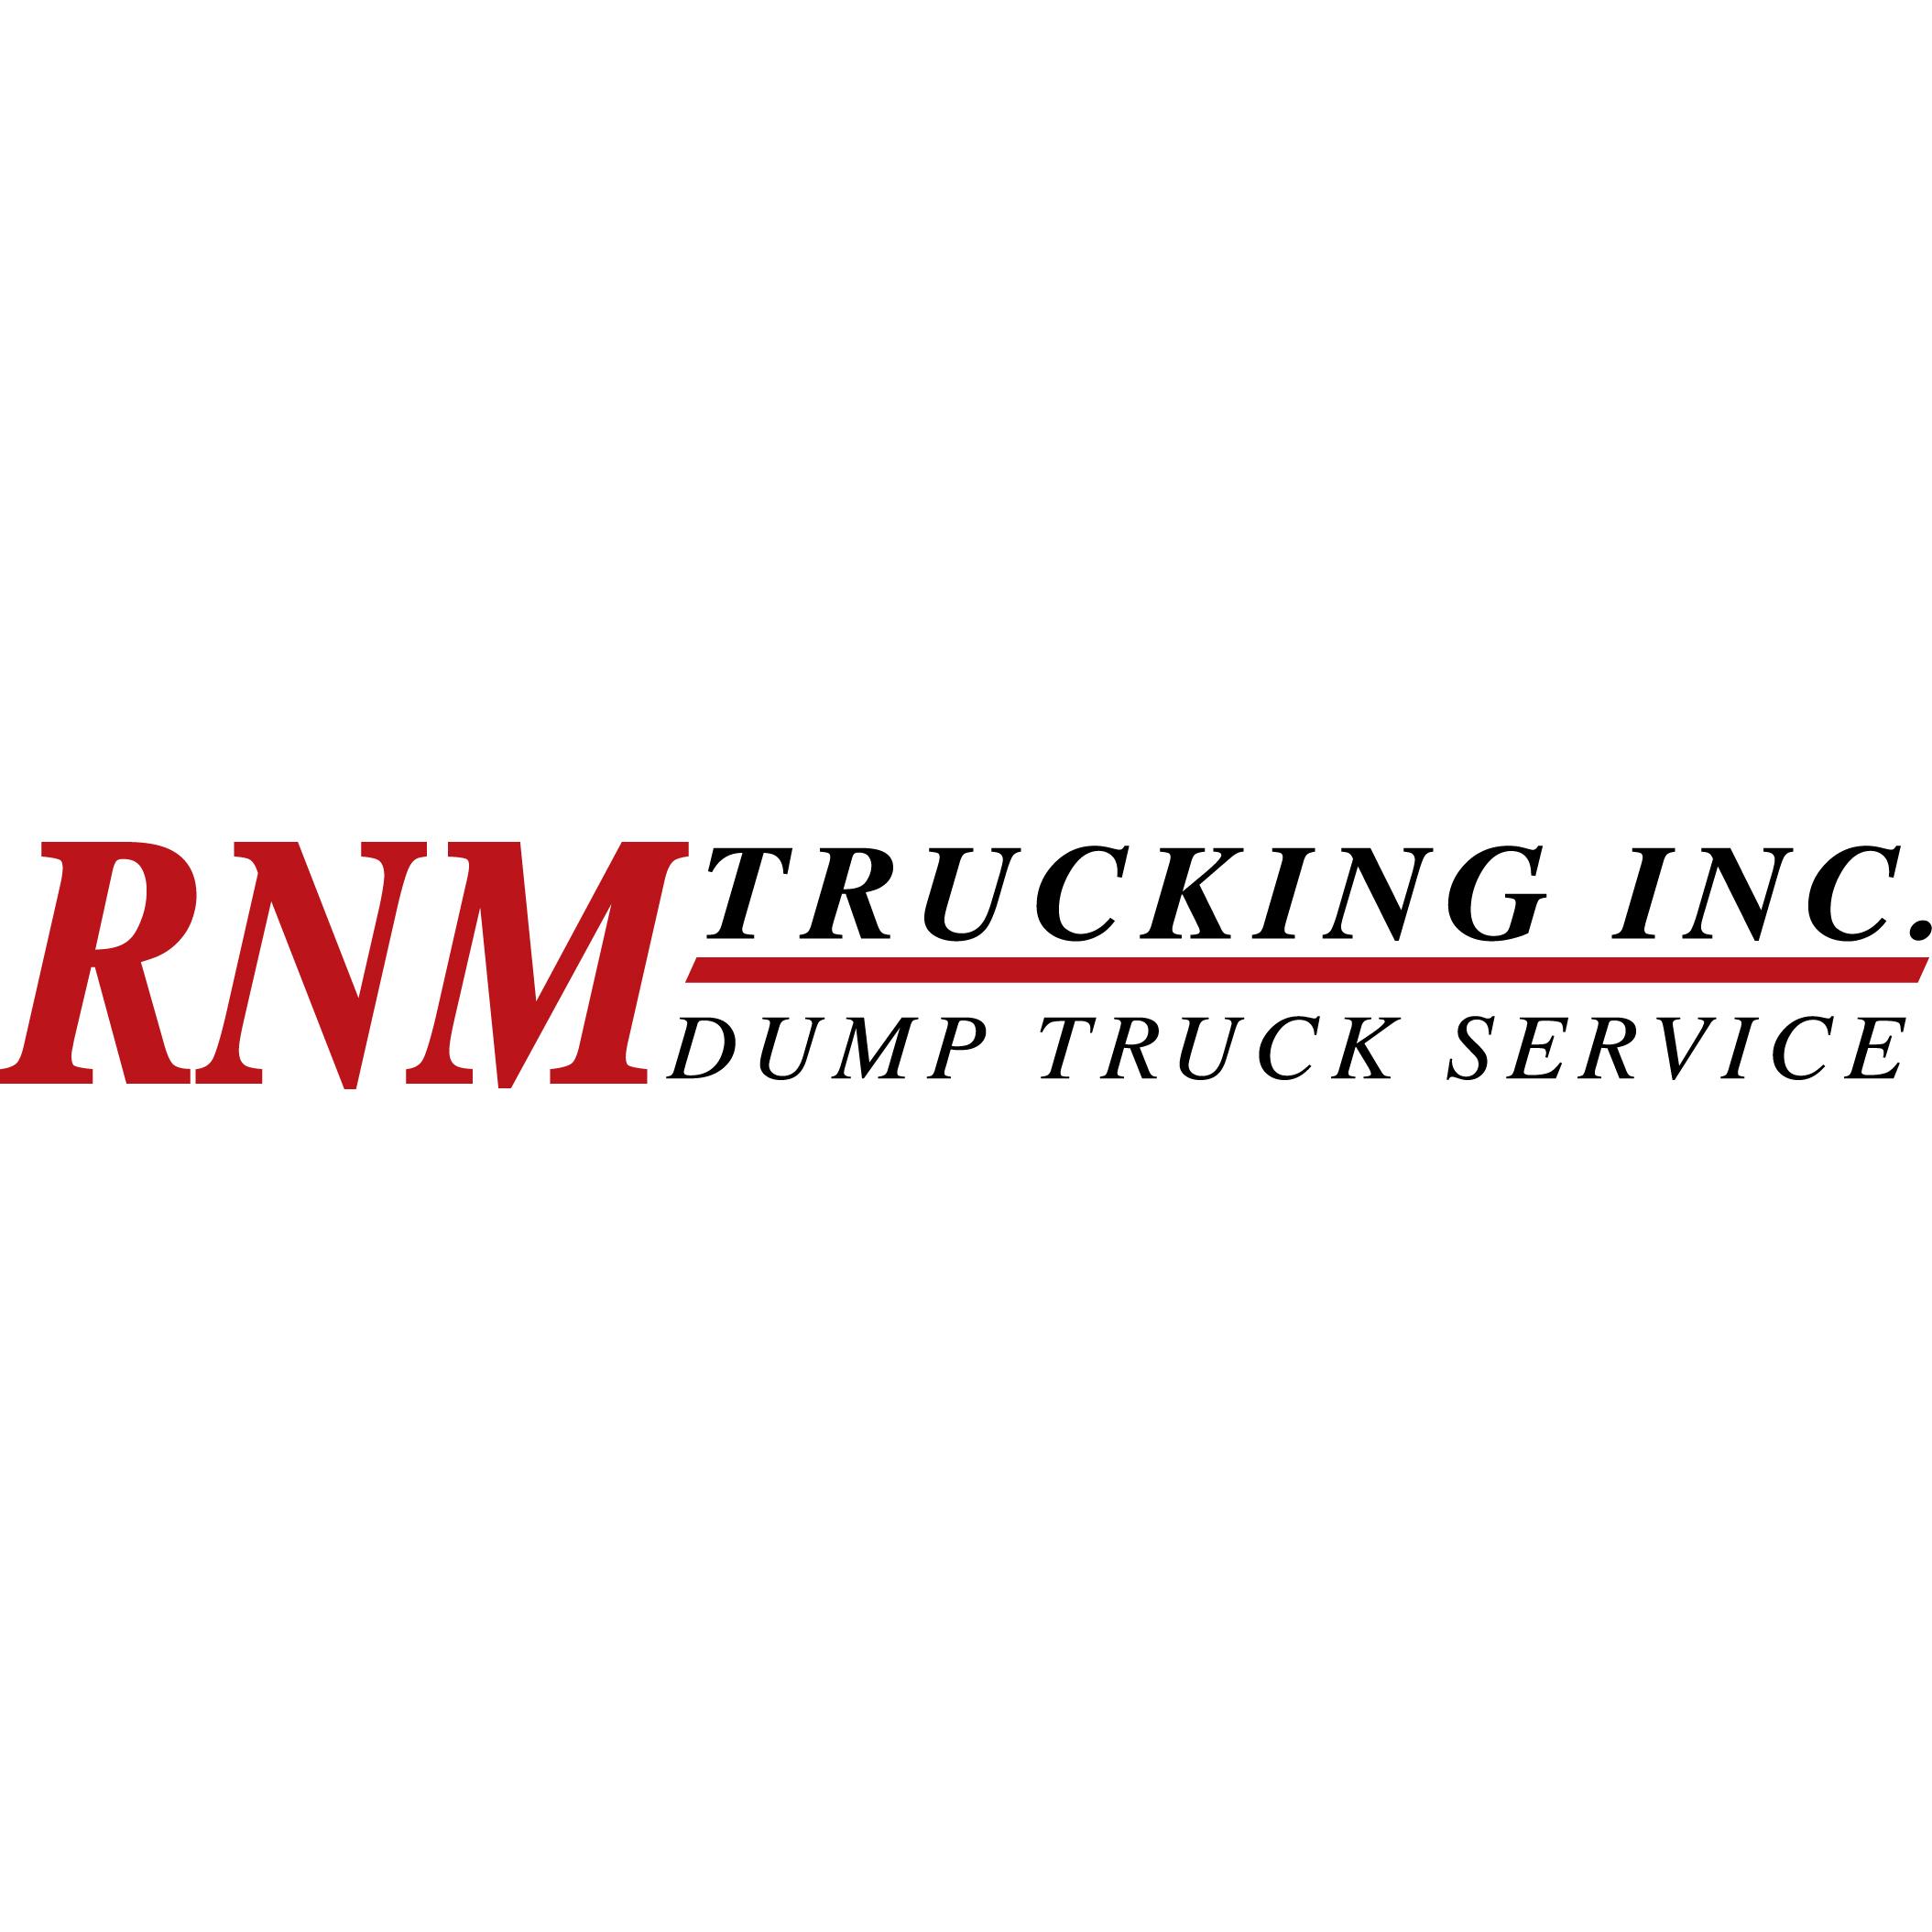 RNM Trucking image 1